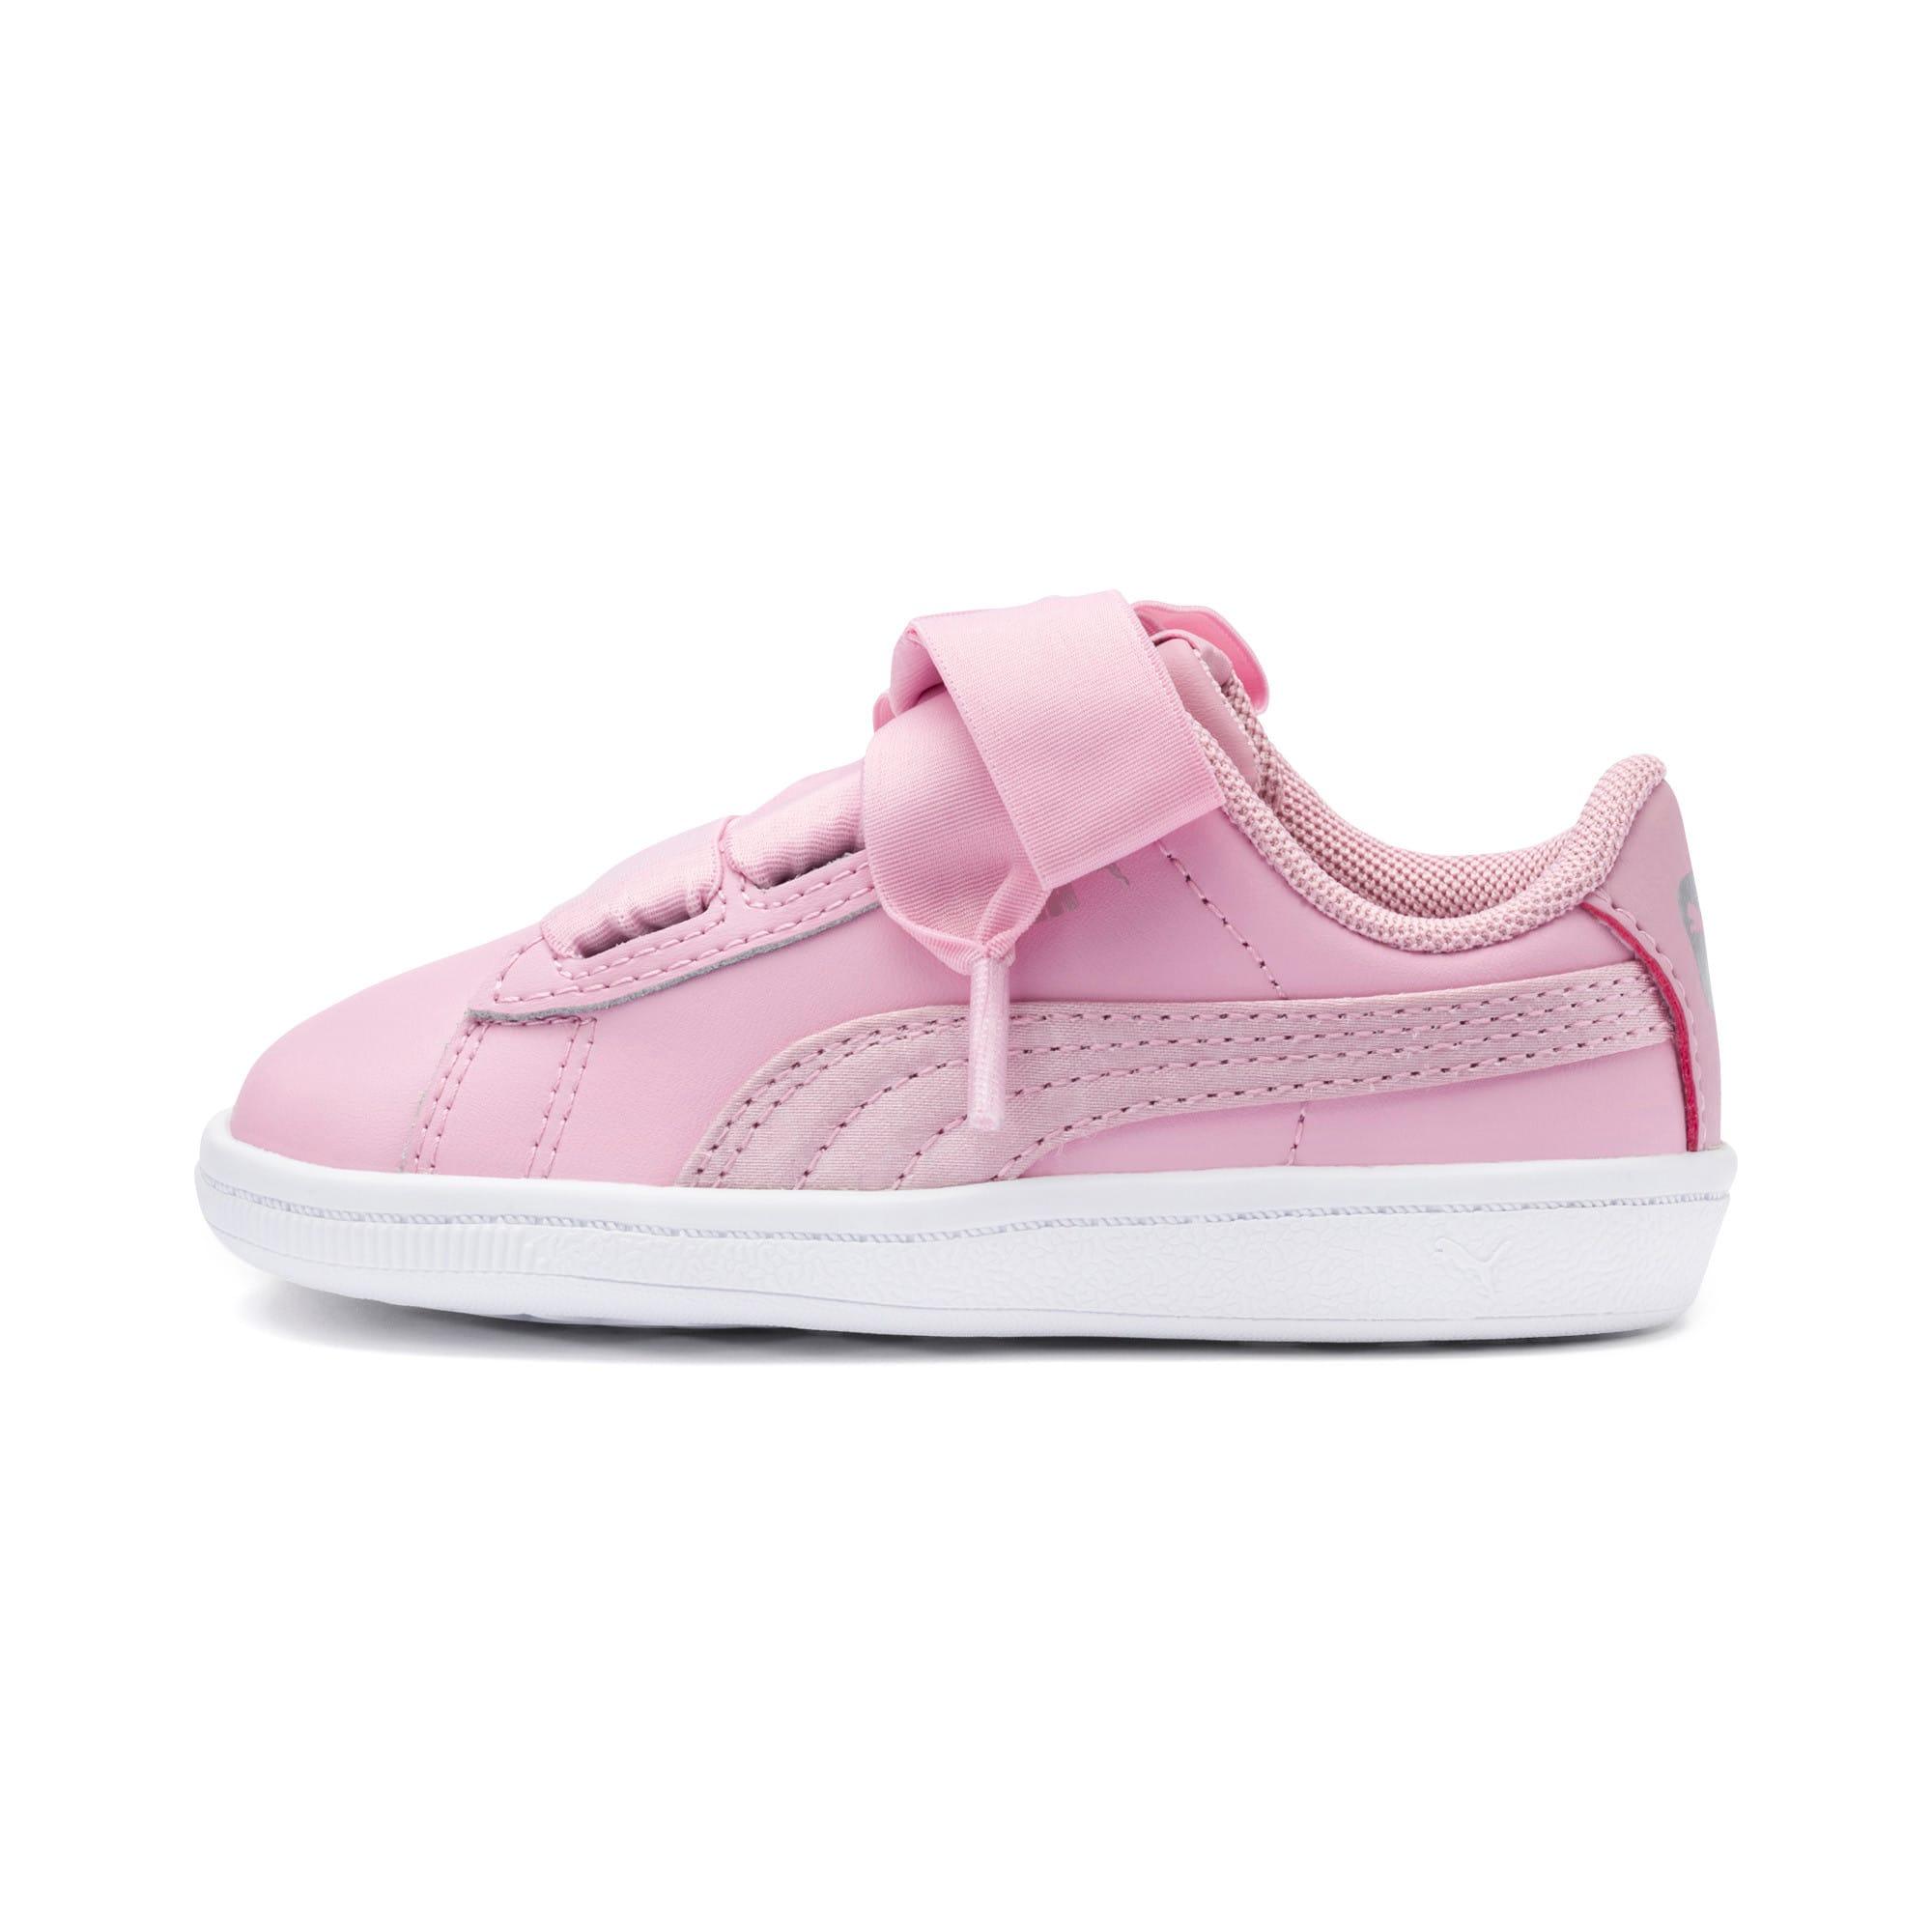 Miniatura 1 de ZapatosPUMA Vikky Ribbon Satin AC para niños, Pale Pink-Pale Pink, mediano